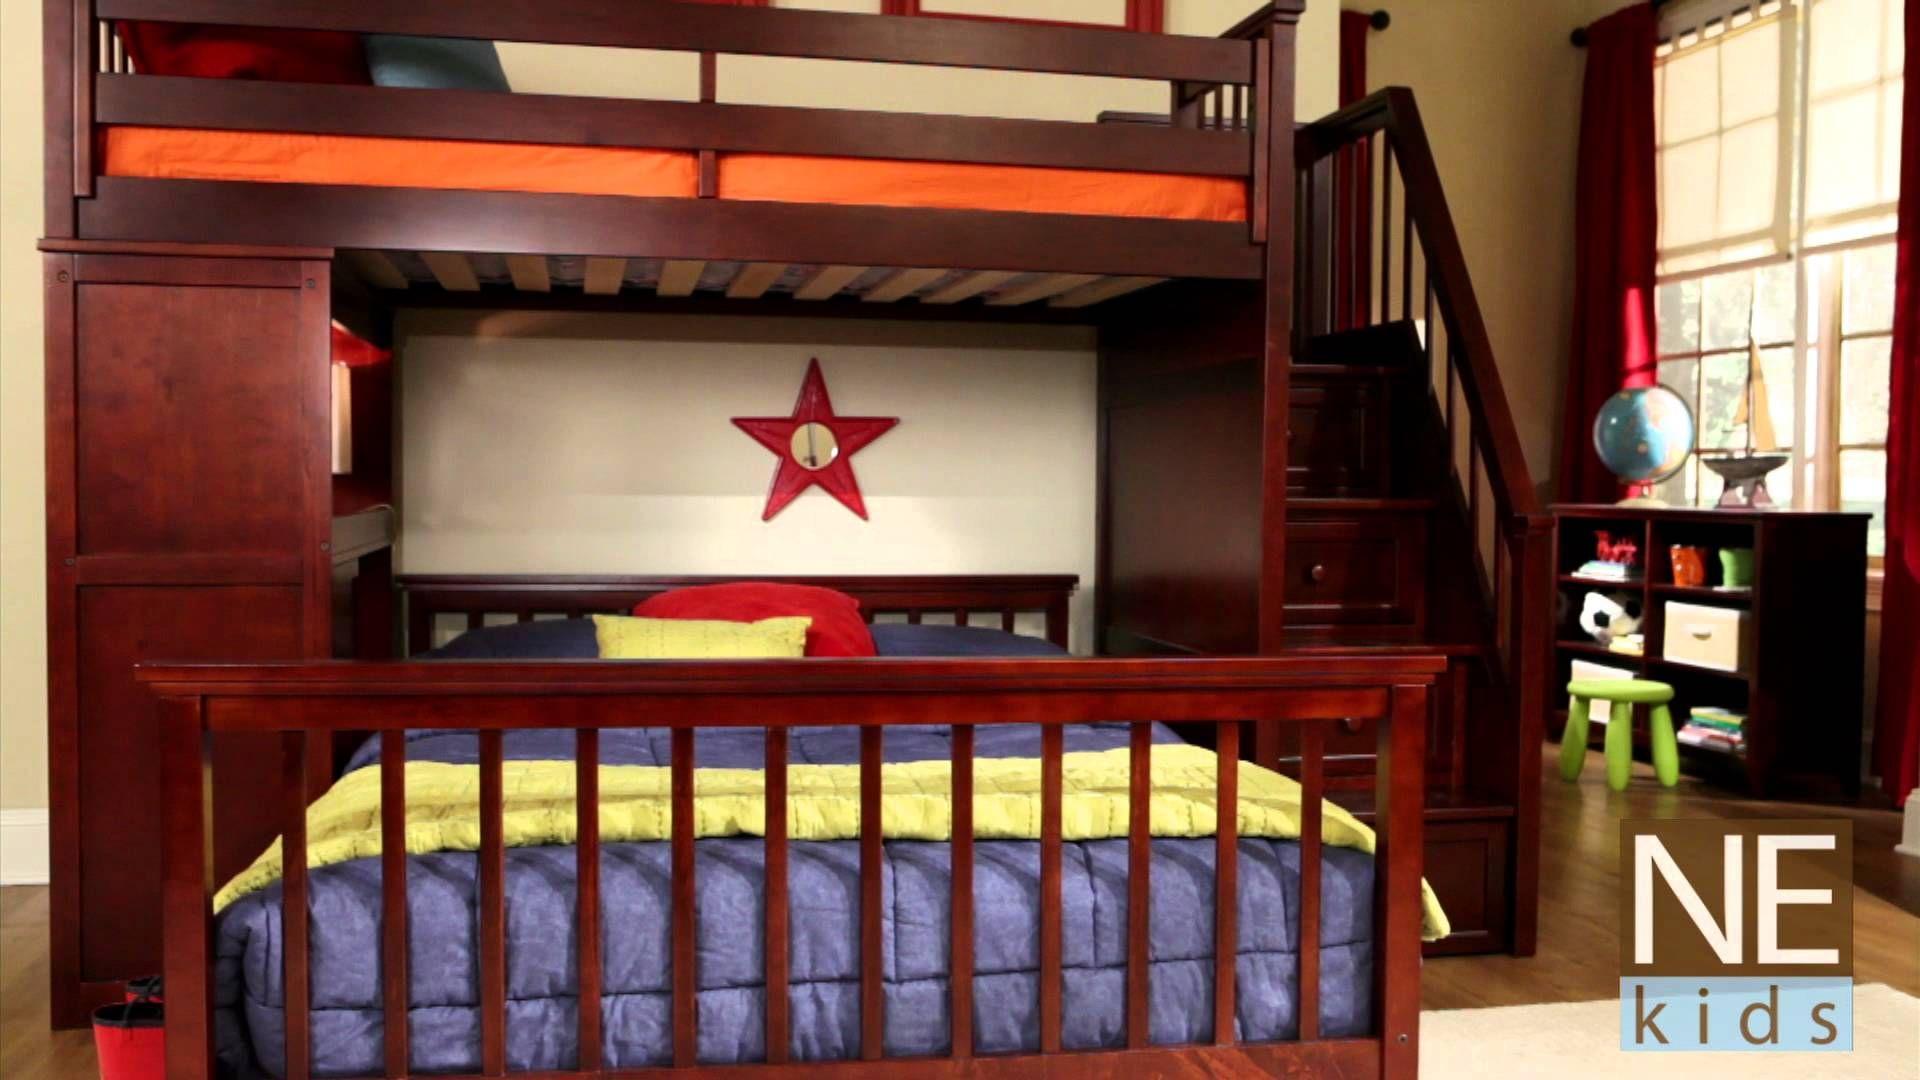 Ne kids stair loft kidus room pinterest lofts staircases and room